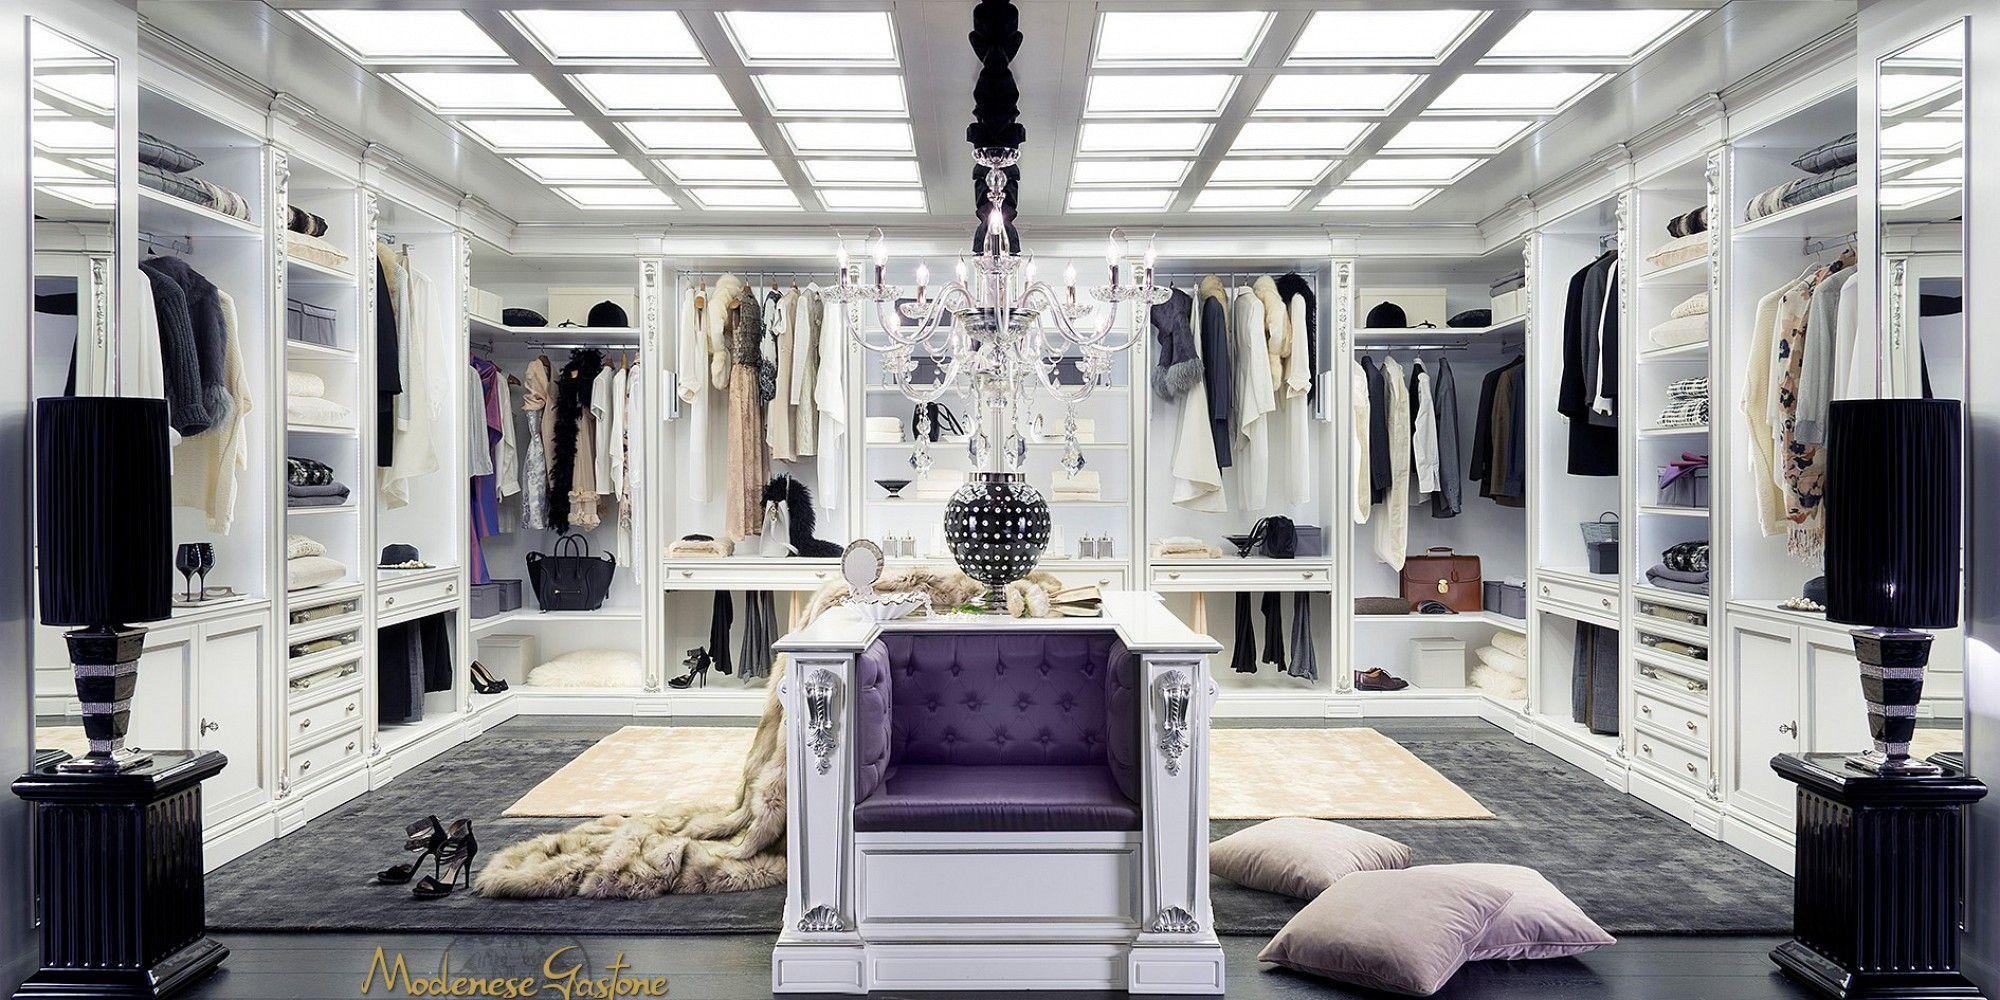 open classic wardrobe | Classic | Pinterest | Classic wardrobe